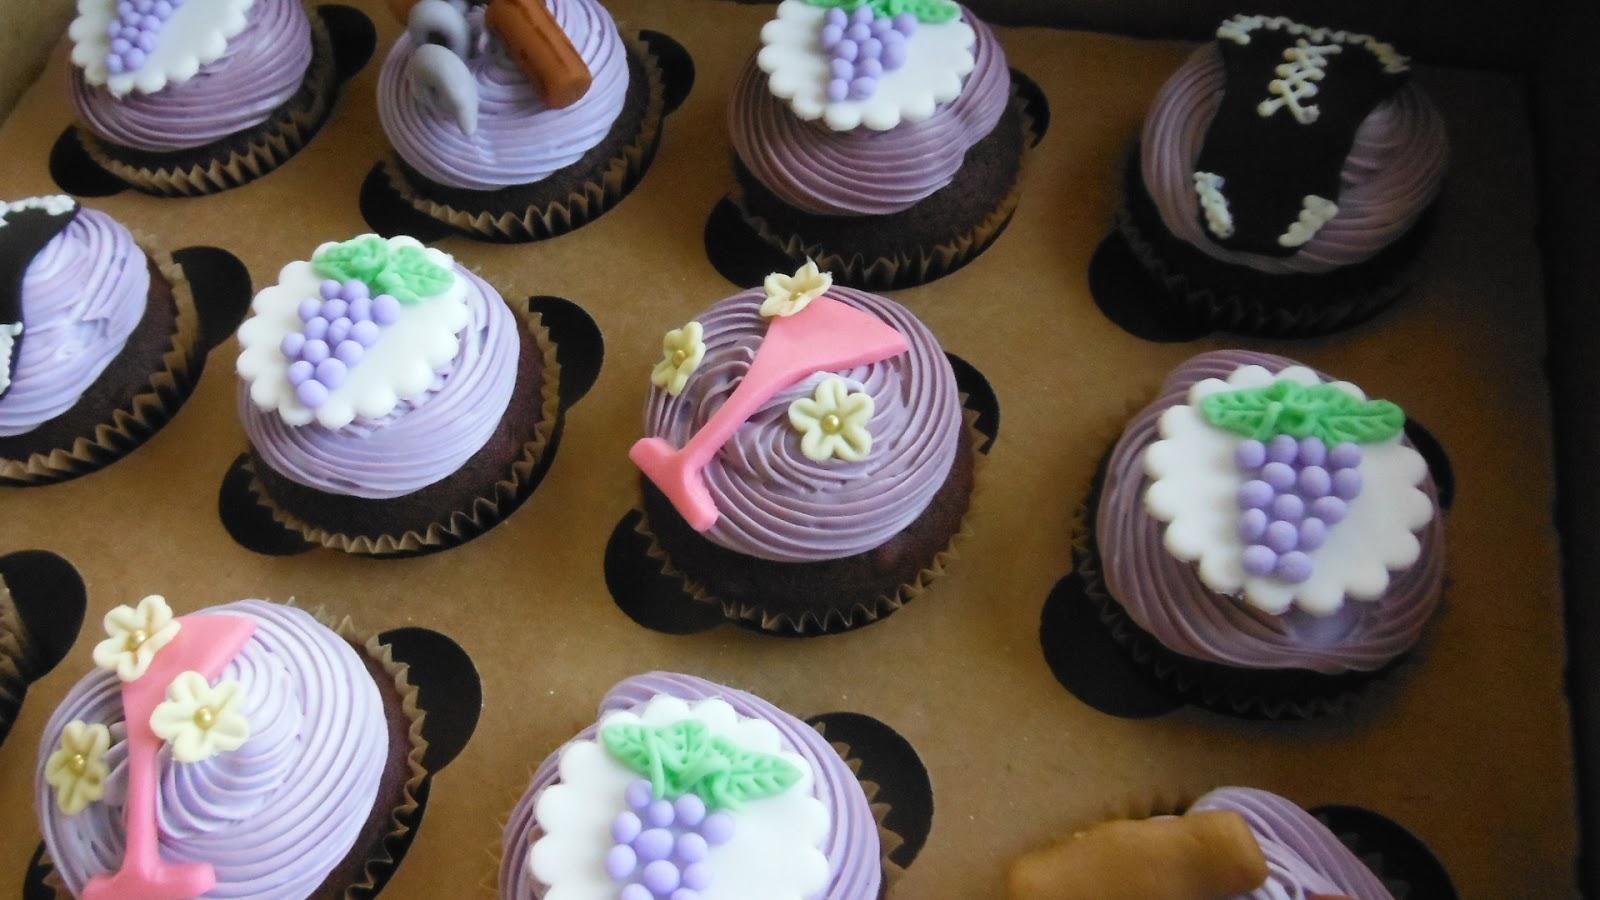 Eastern Long Island Cupcakes